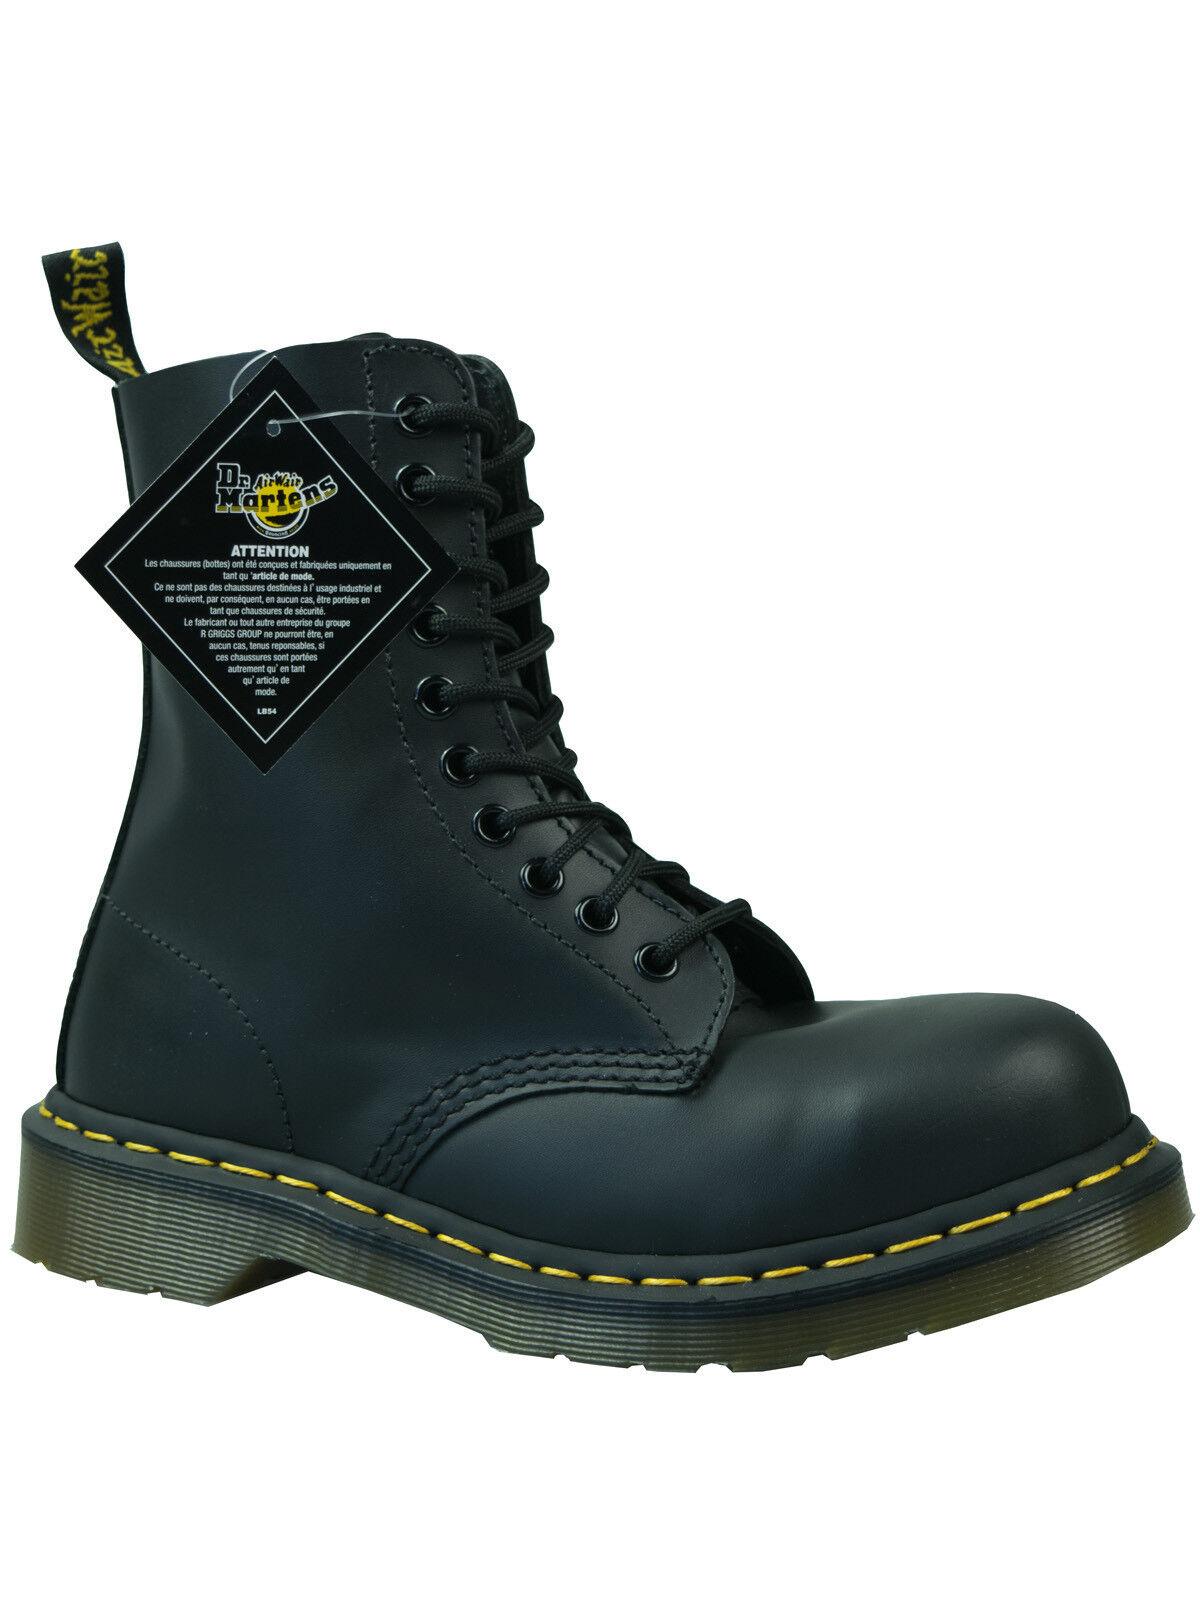 Dr. Martens doc 10 agujeros botas/boot/tapa de acero 1919 10105001 negro